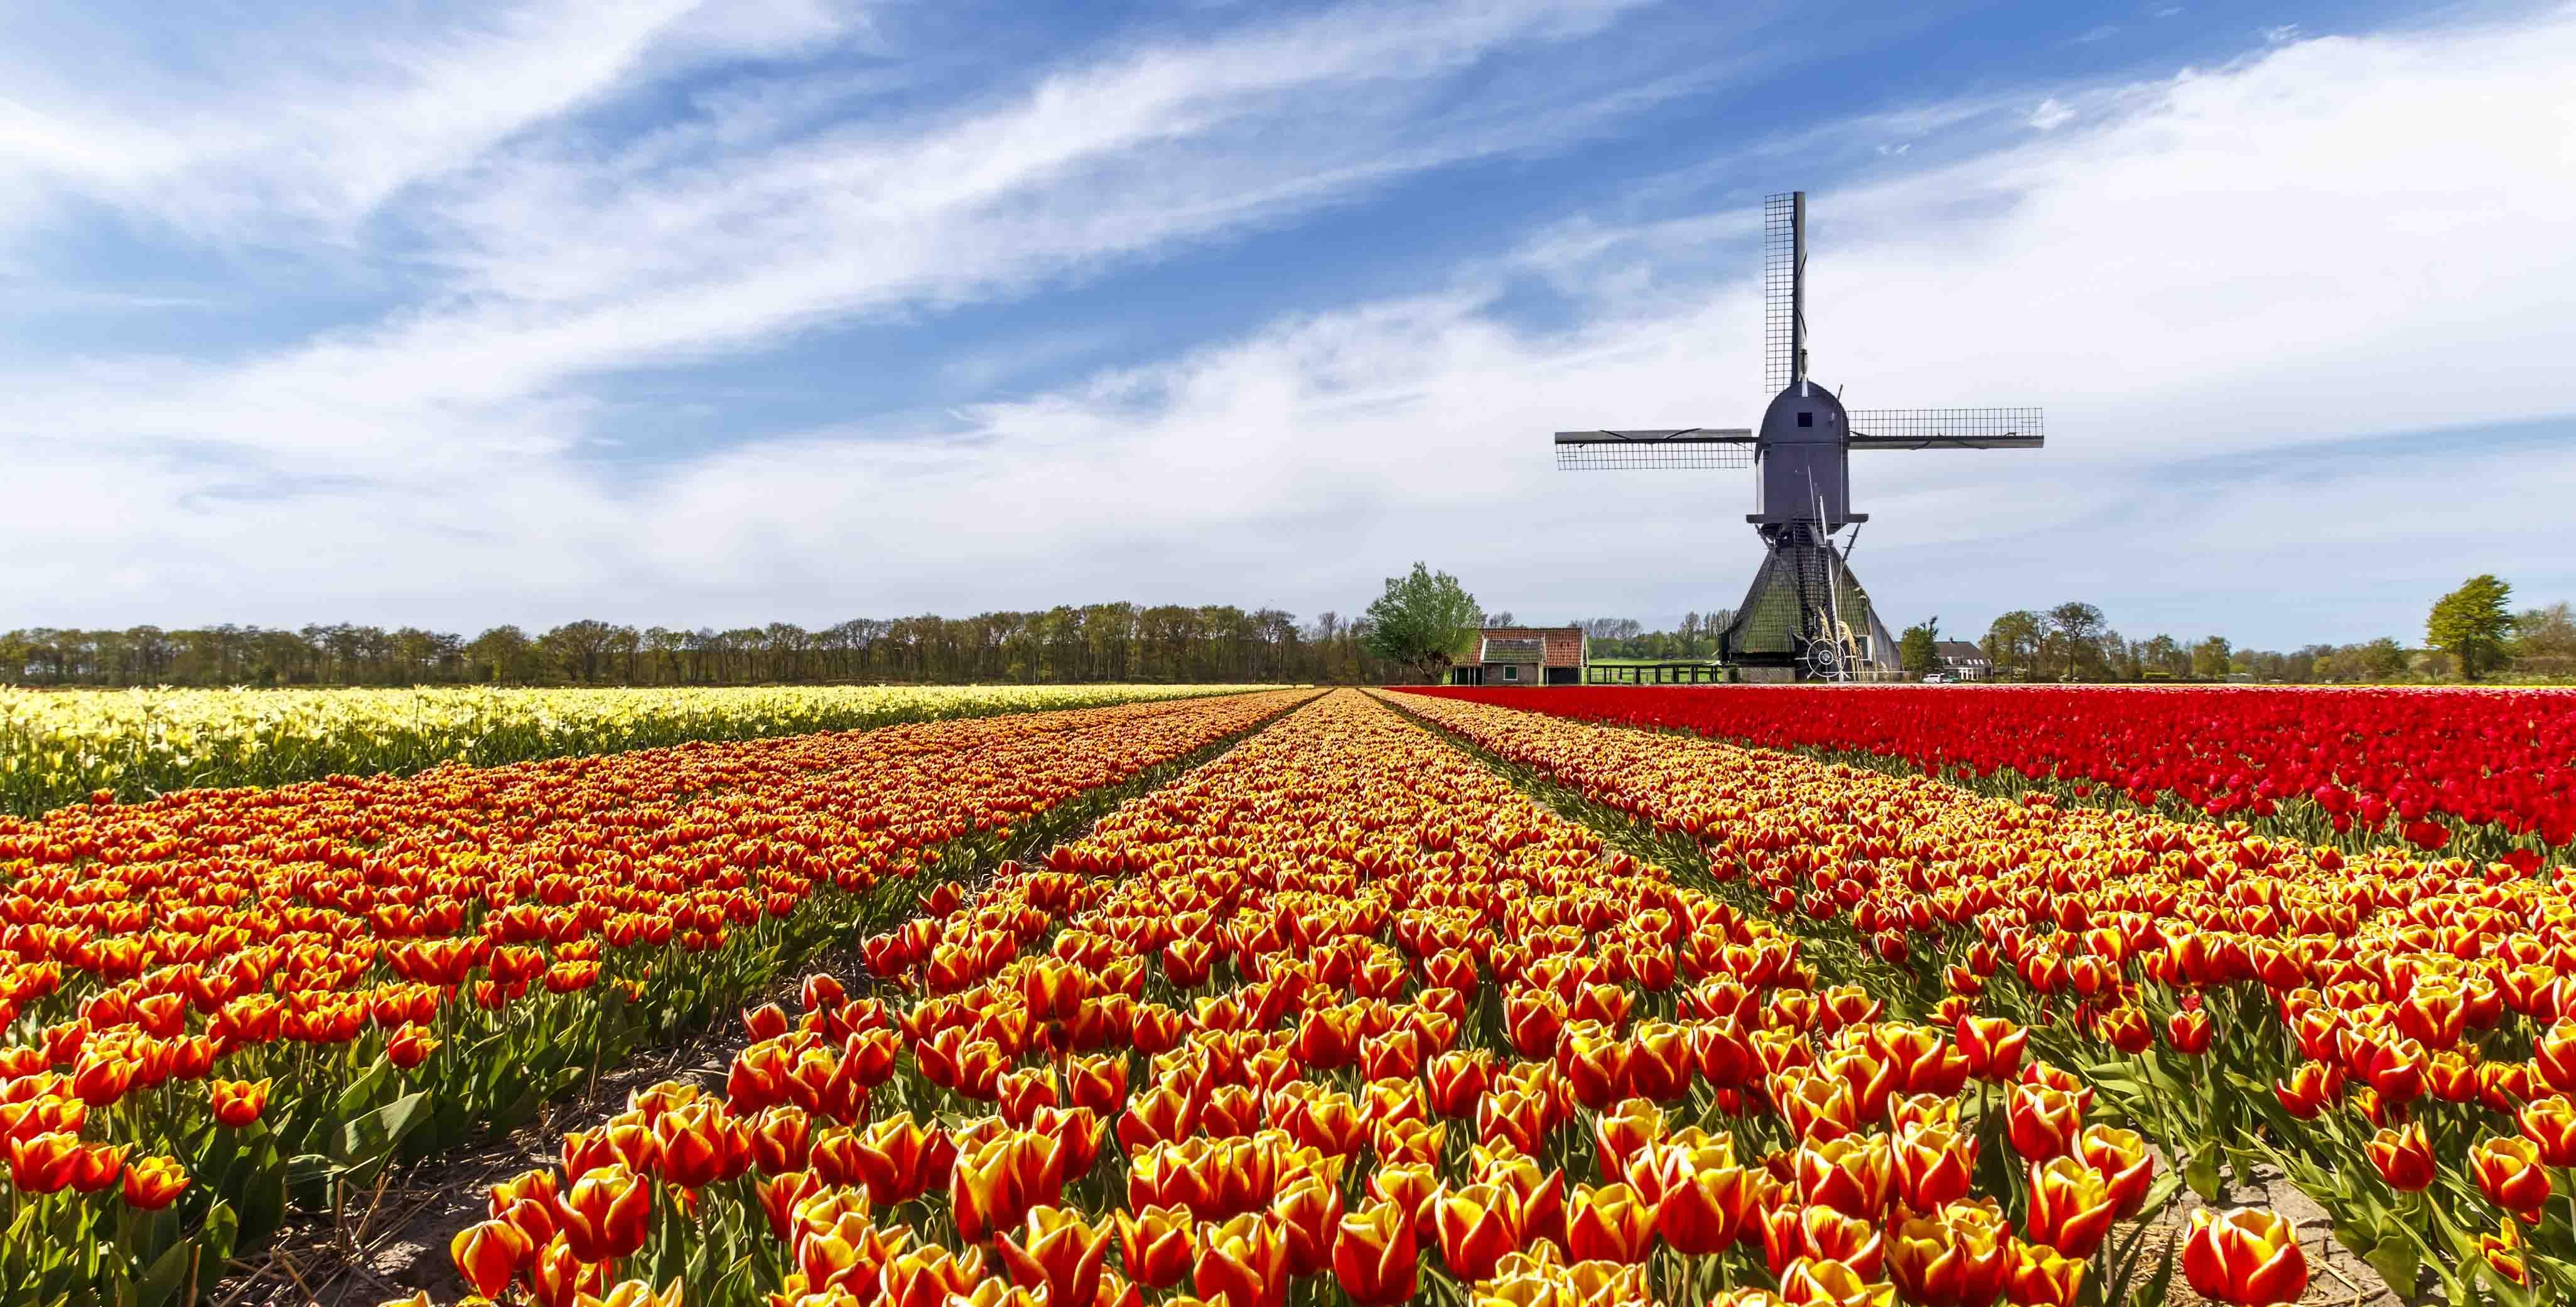 Images Of Beautiful Gardens Amsterdam And The Keukenhof Bulb Fields Osprey Holidays